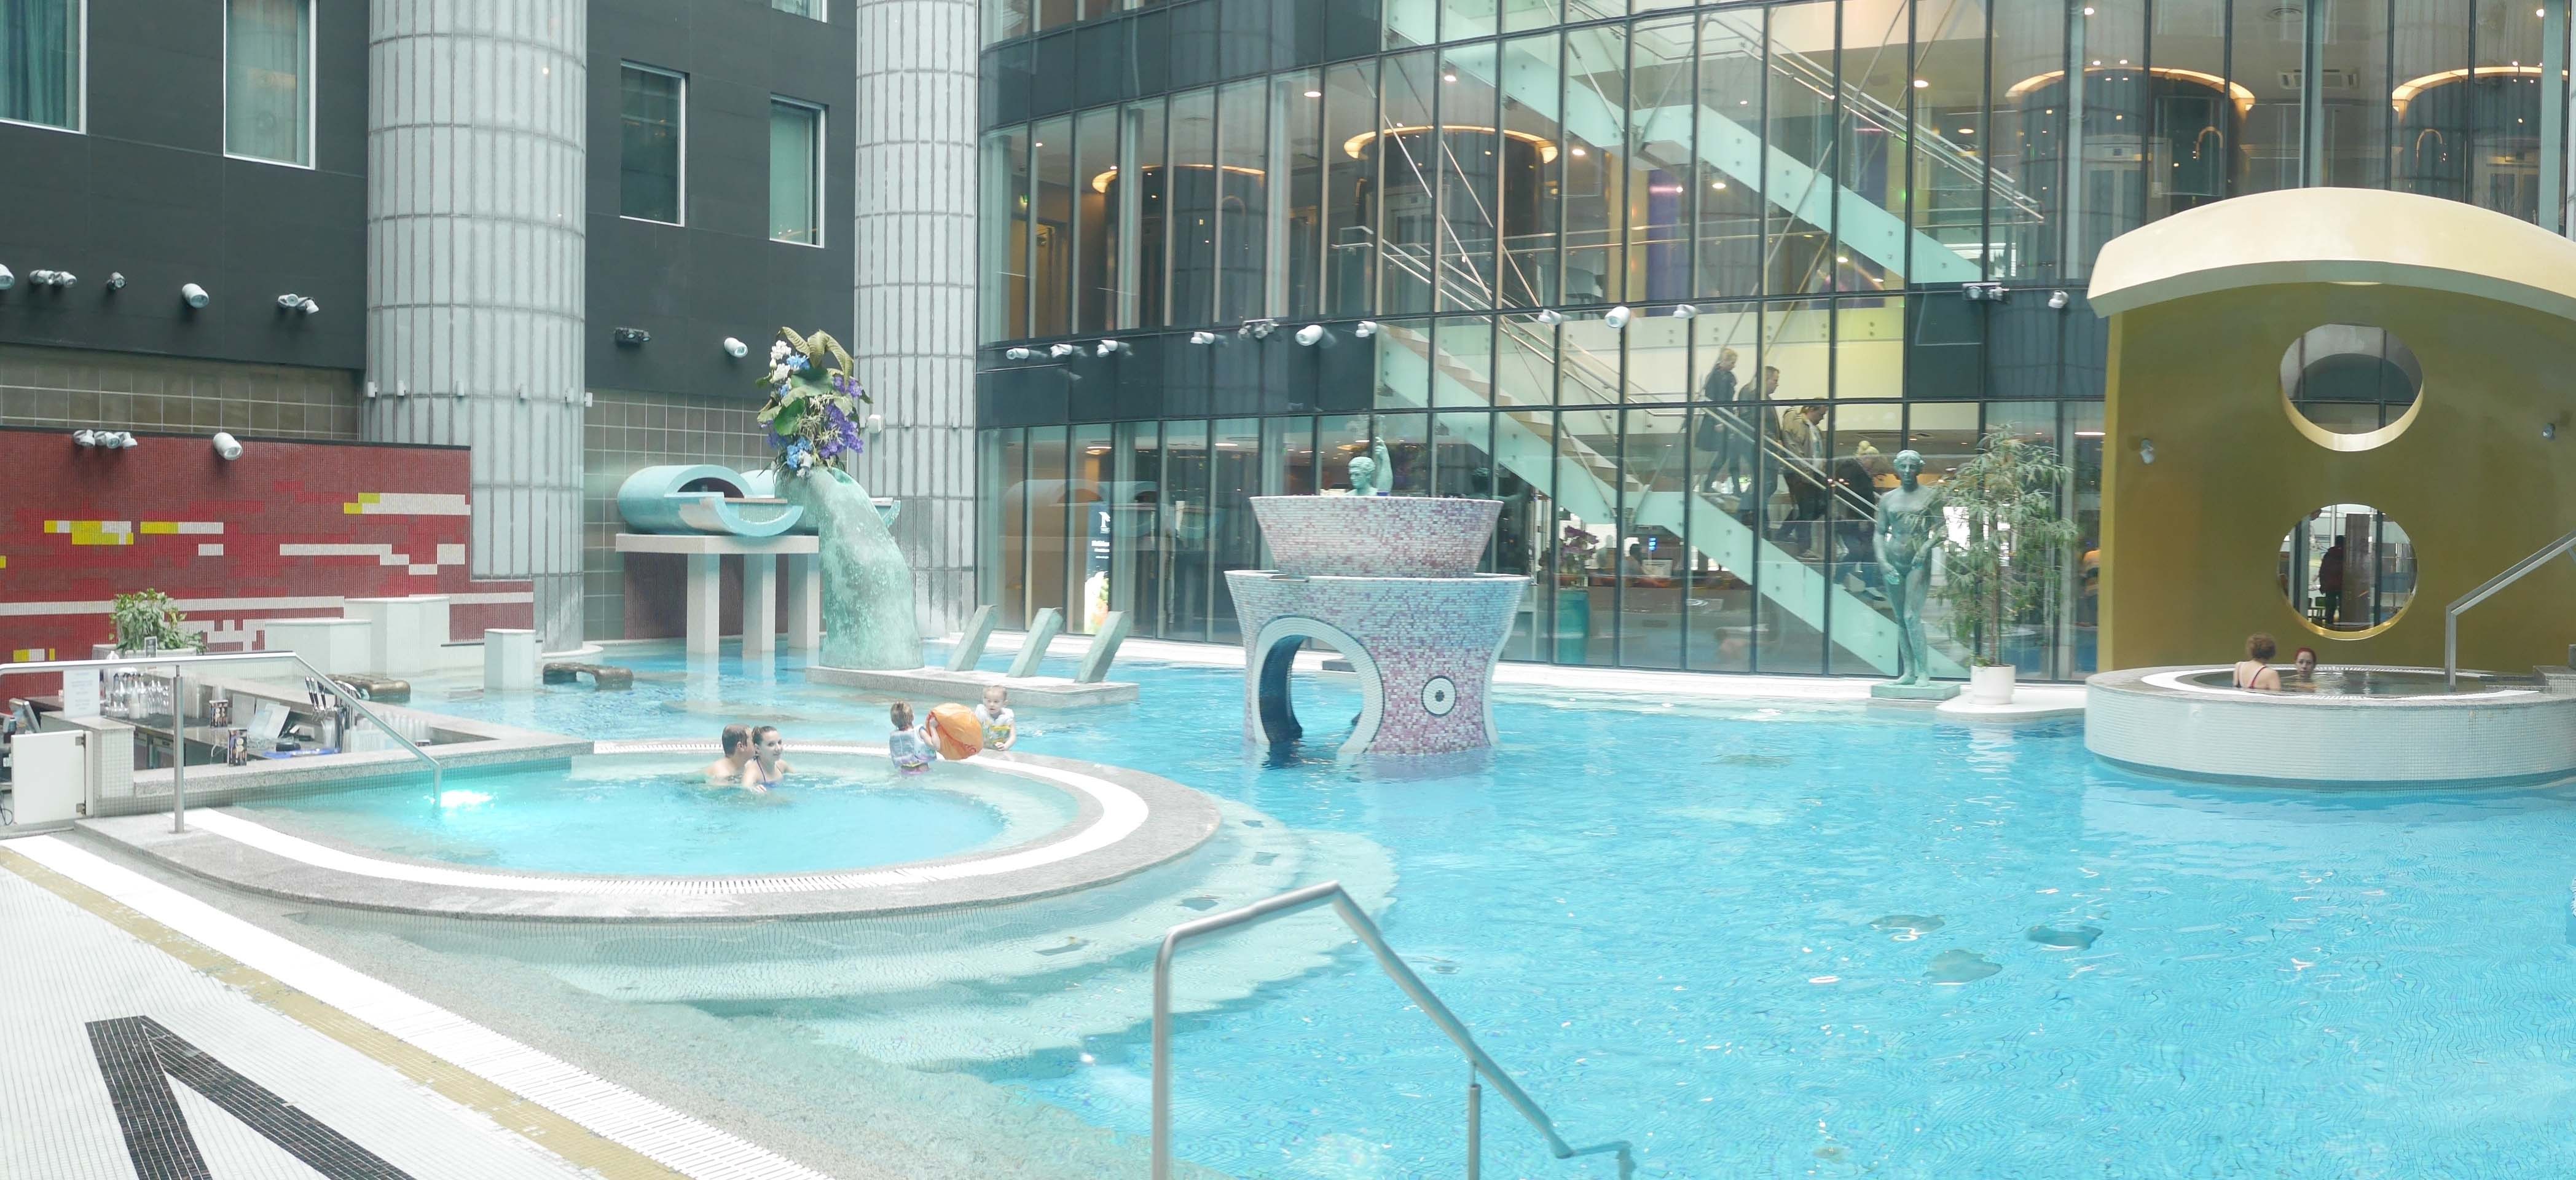 Tallink Spa hotel